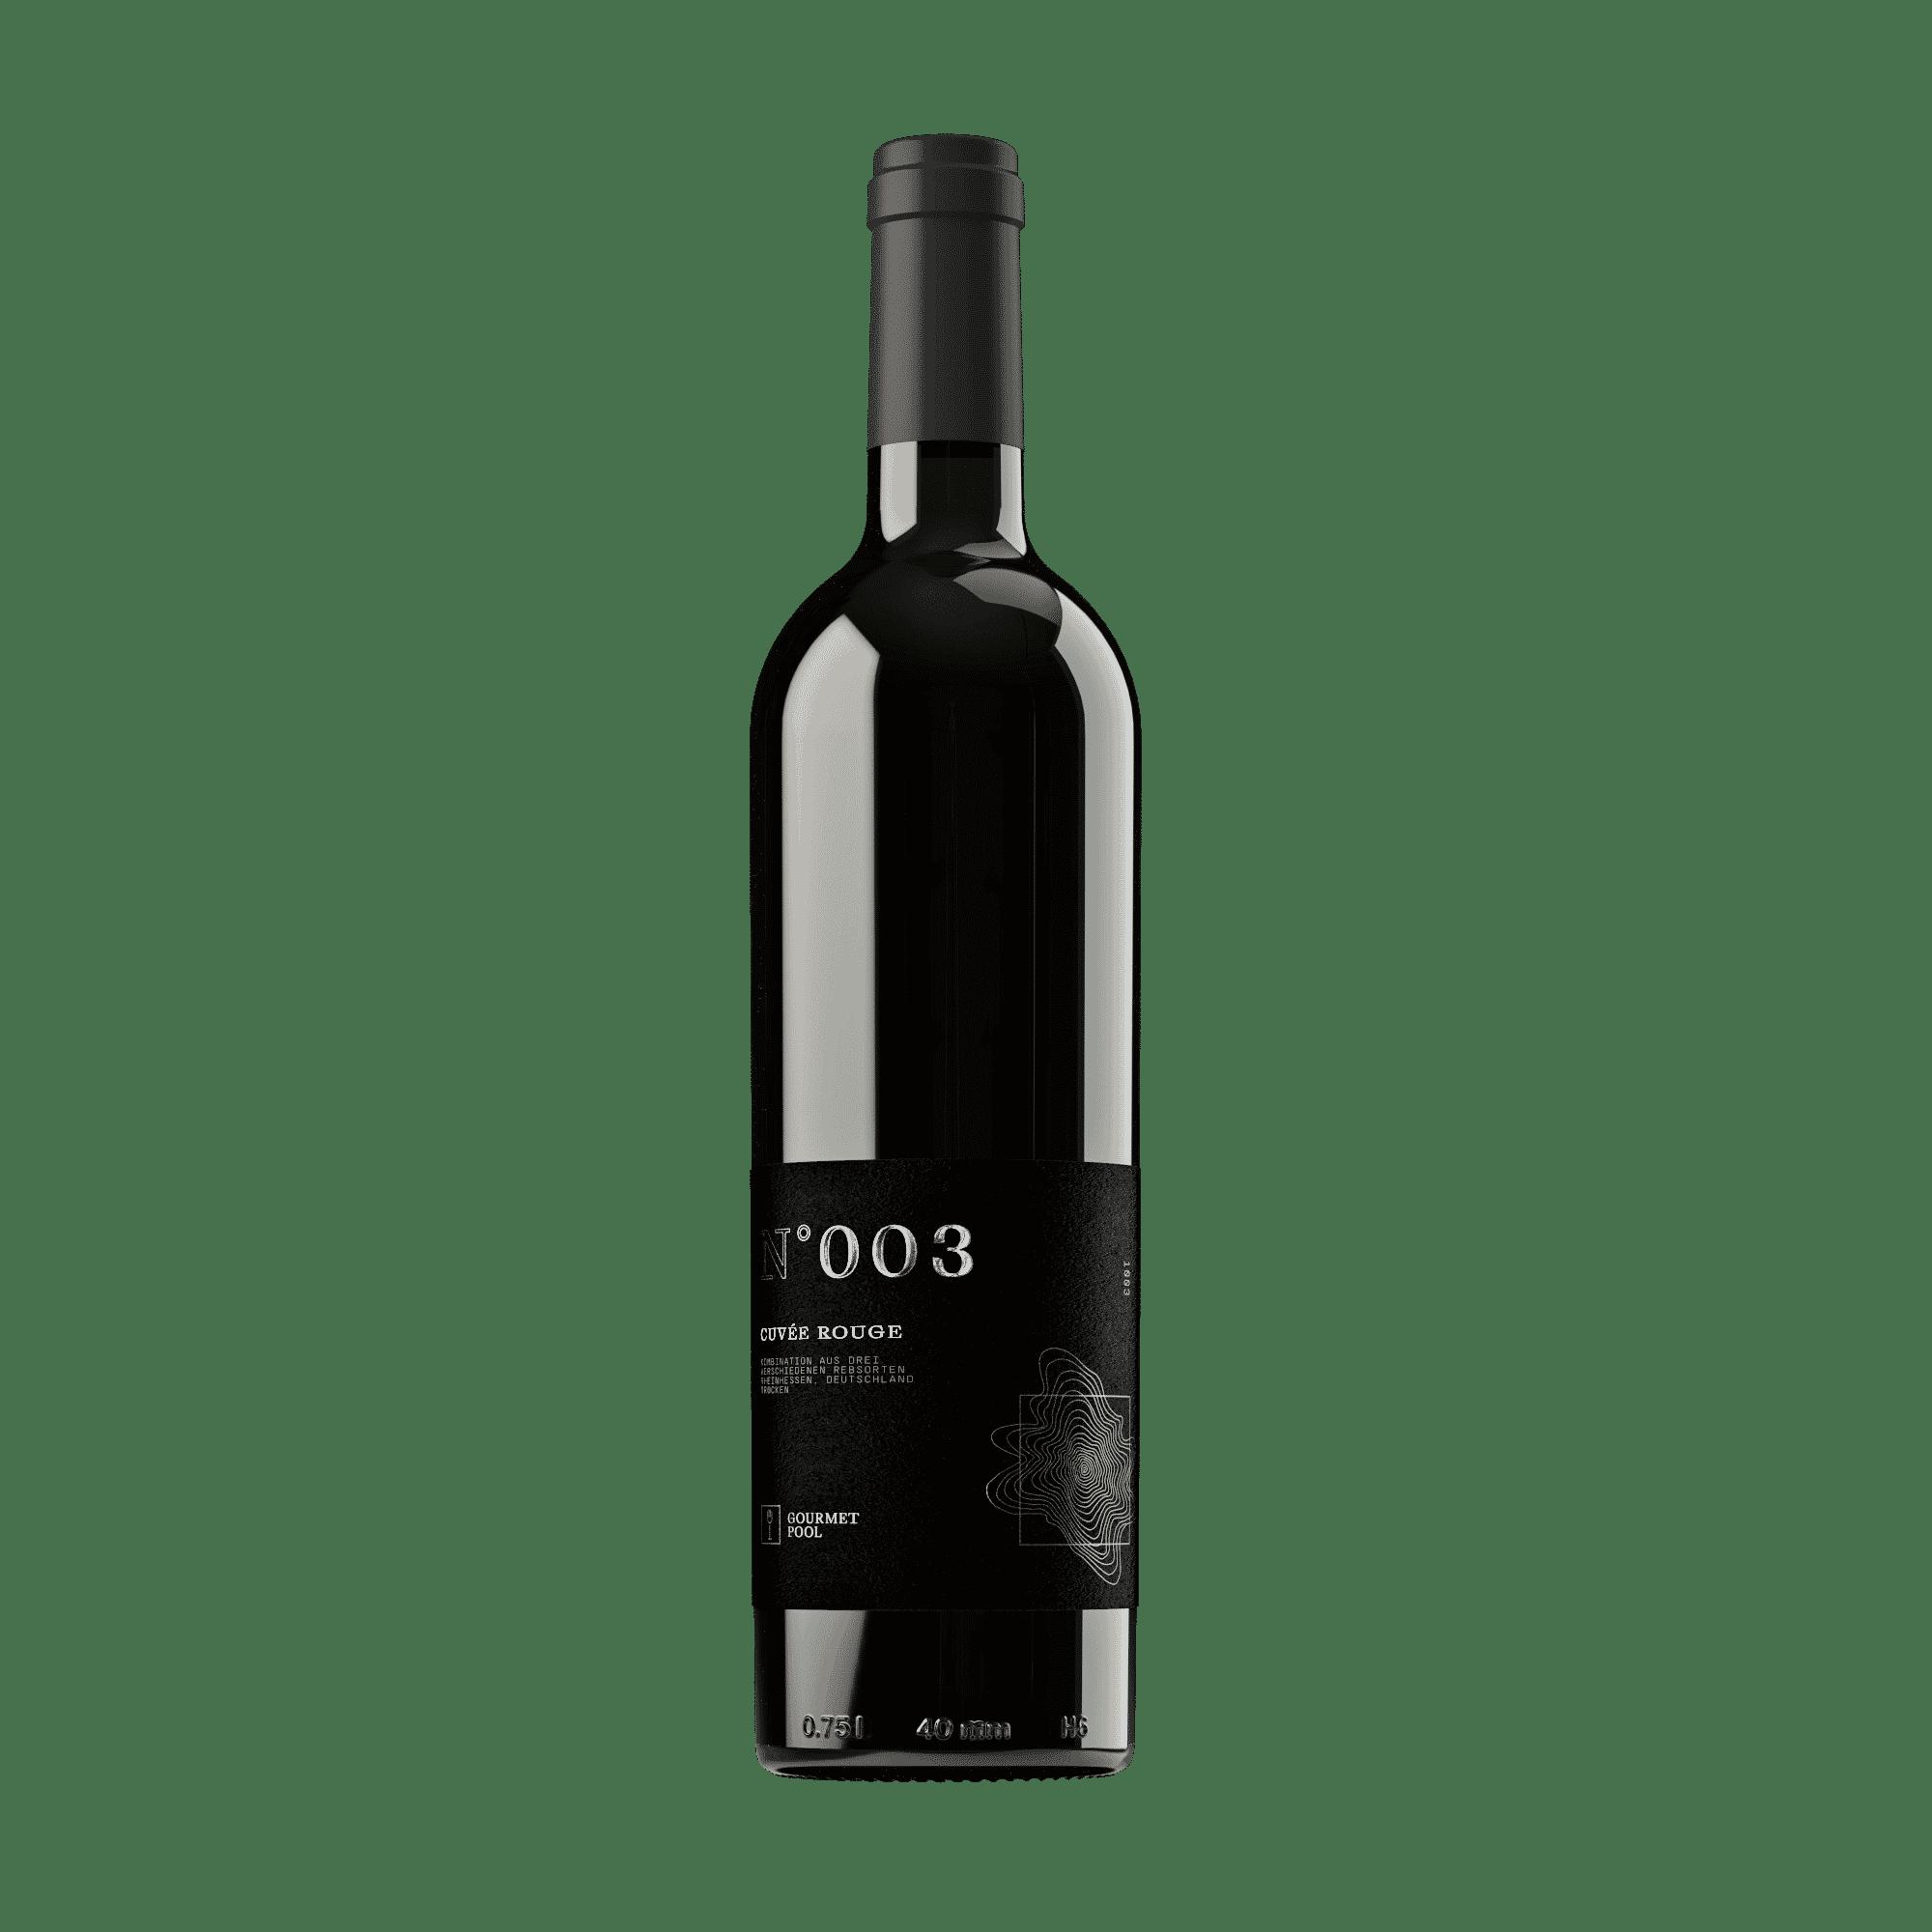 N°003 Cuvée Rouge